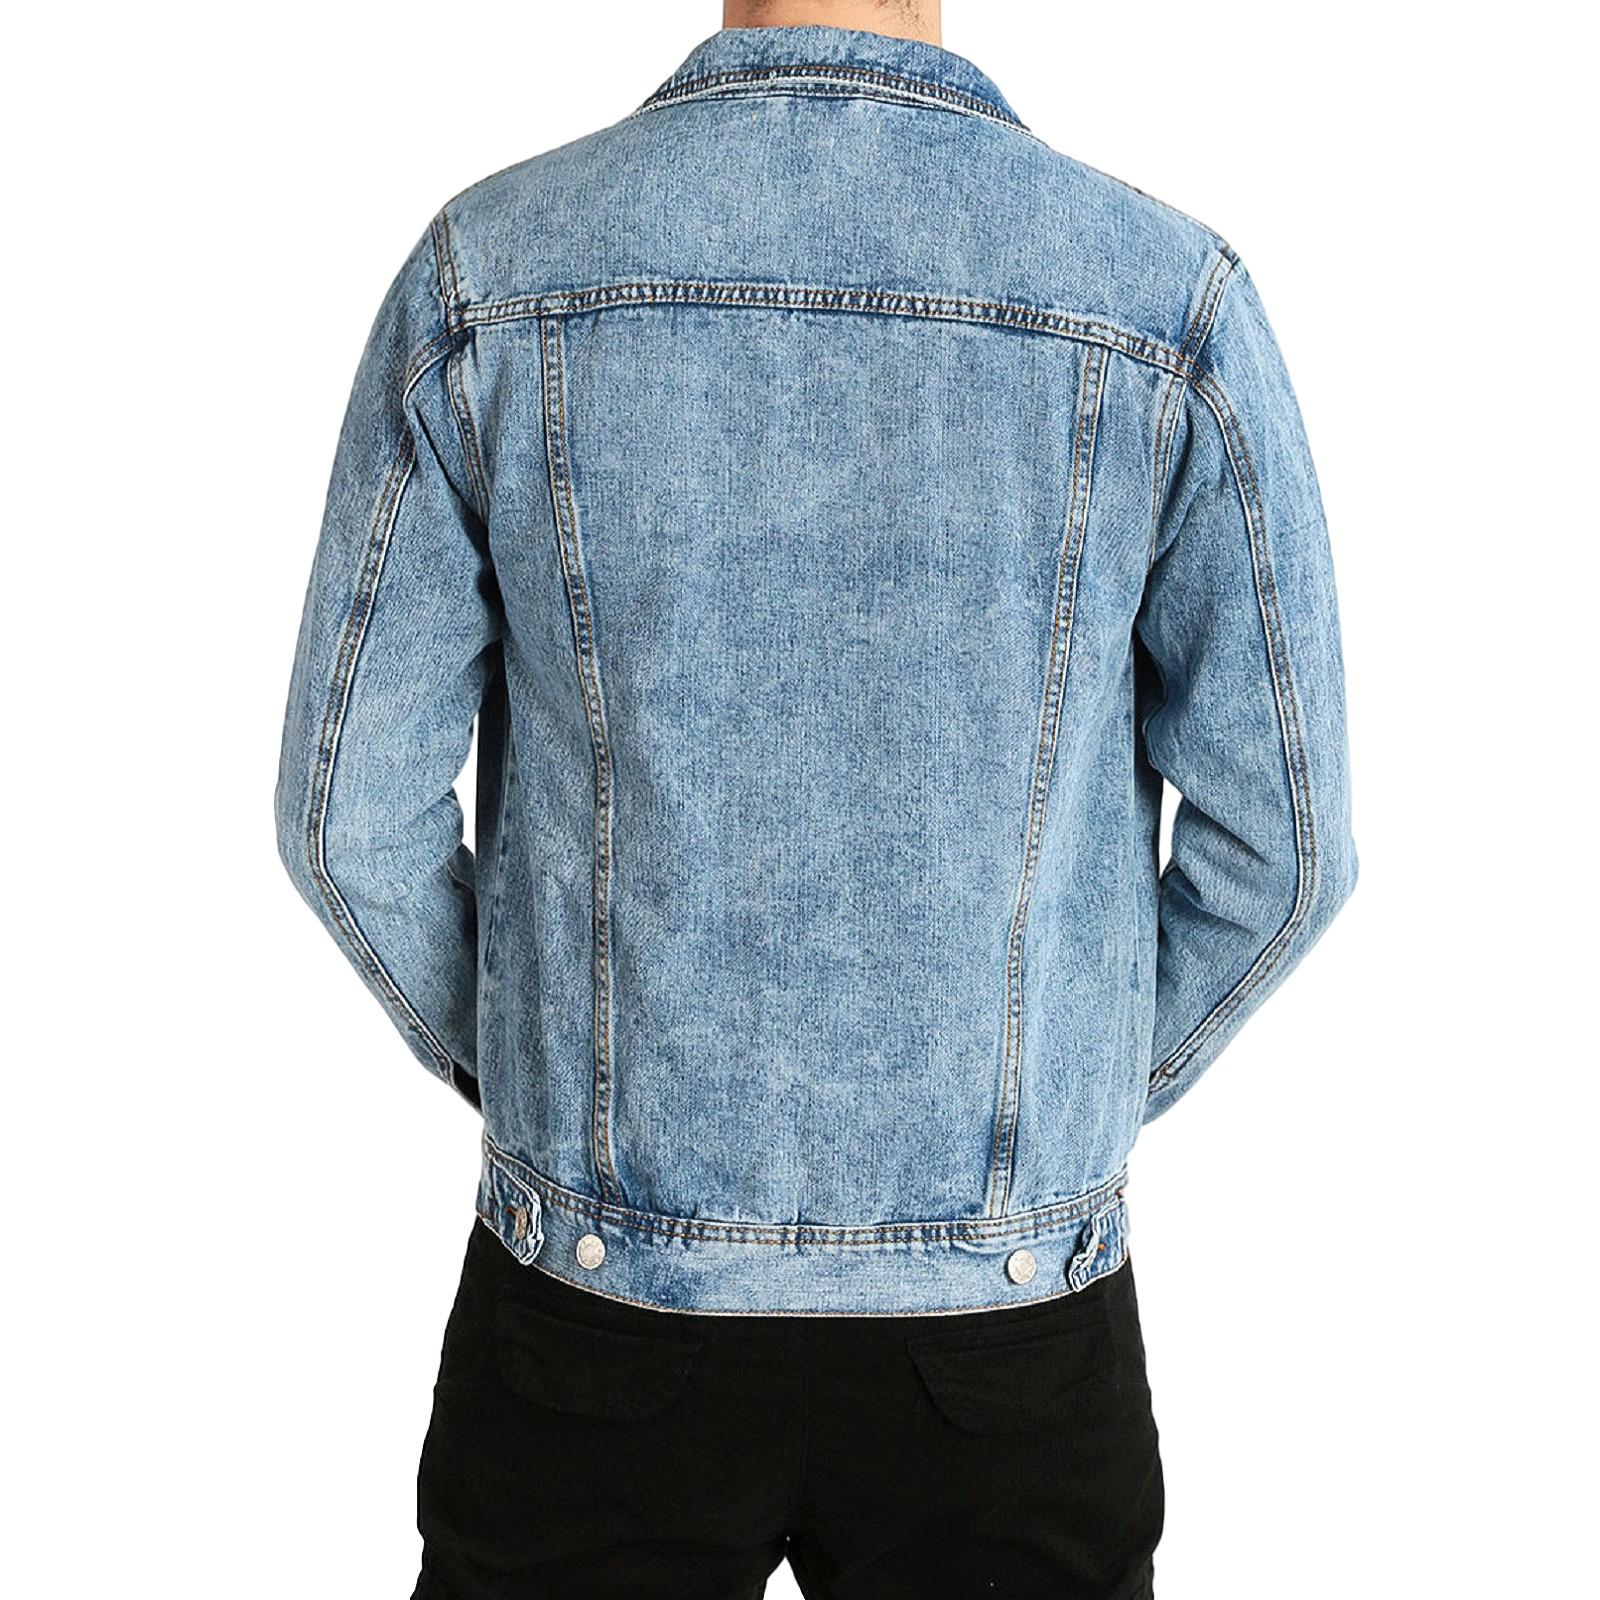 Giubbino-Jeans-Uomo-Giacca-Denim-Casual-Giacca-Slim-Fit-Blu-Chiaro miniatura 11